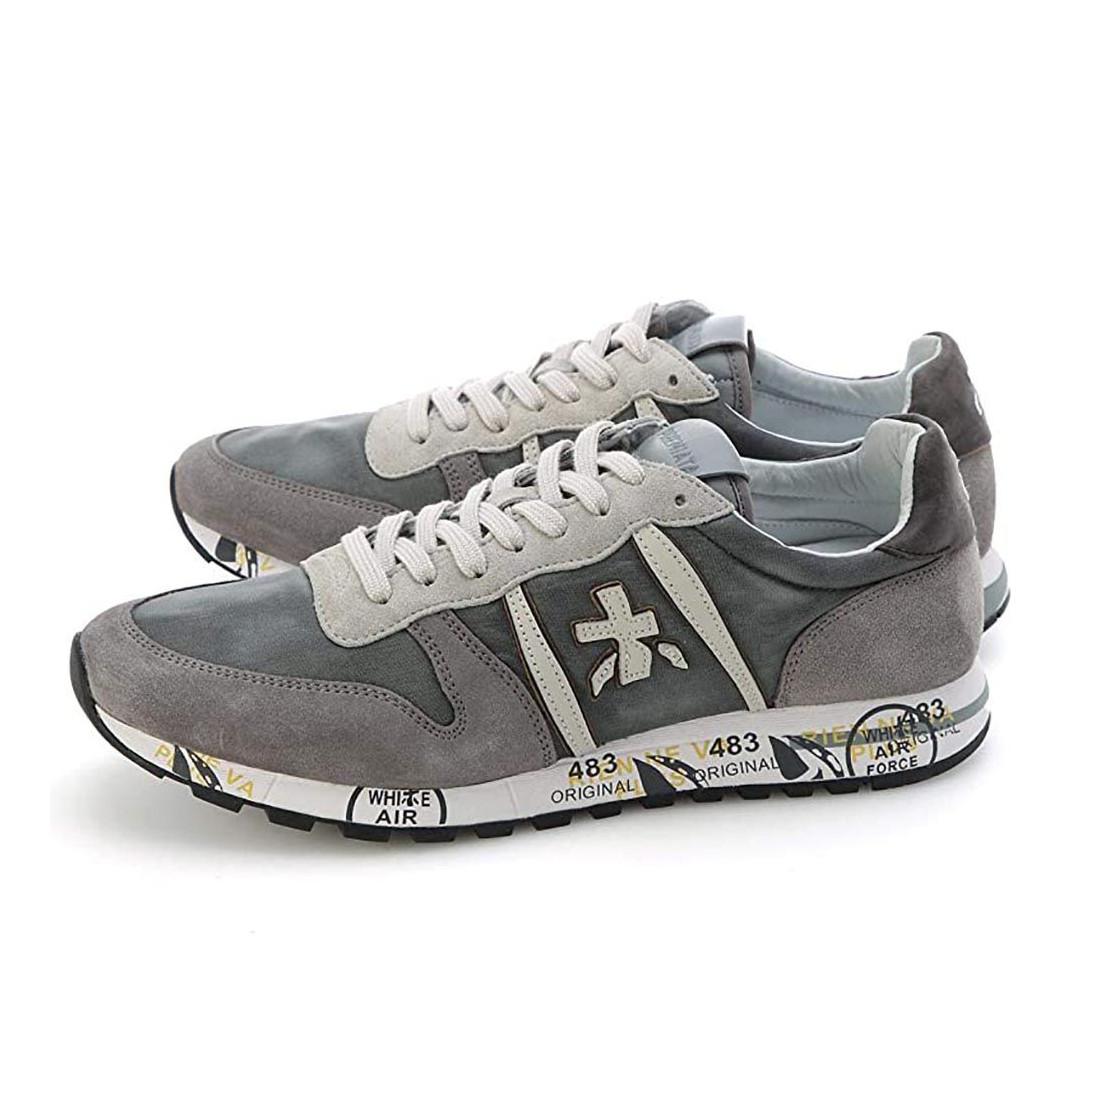 sneakers uomo premiata eric5026 9034